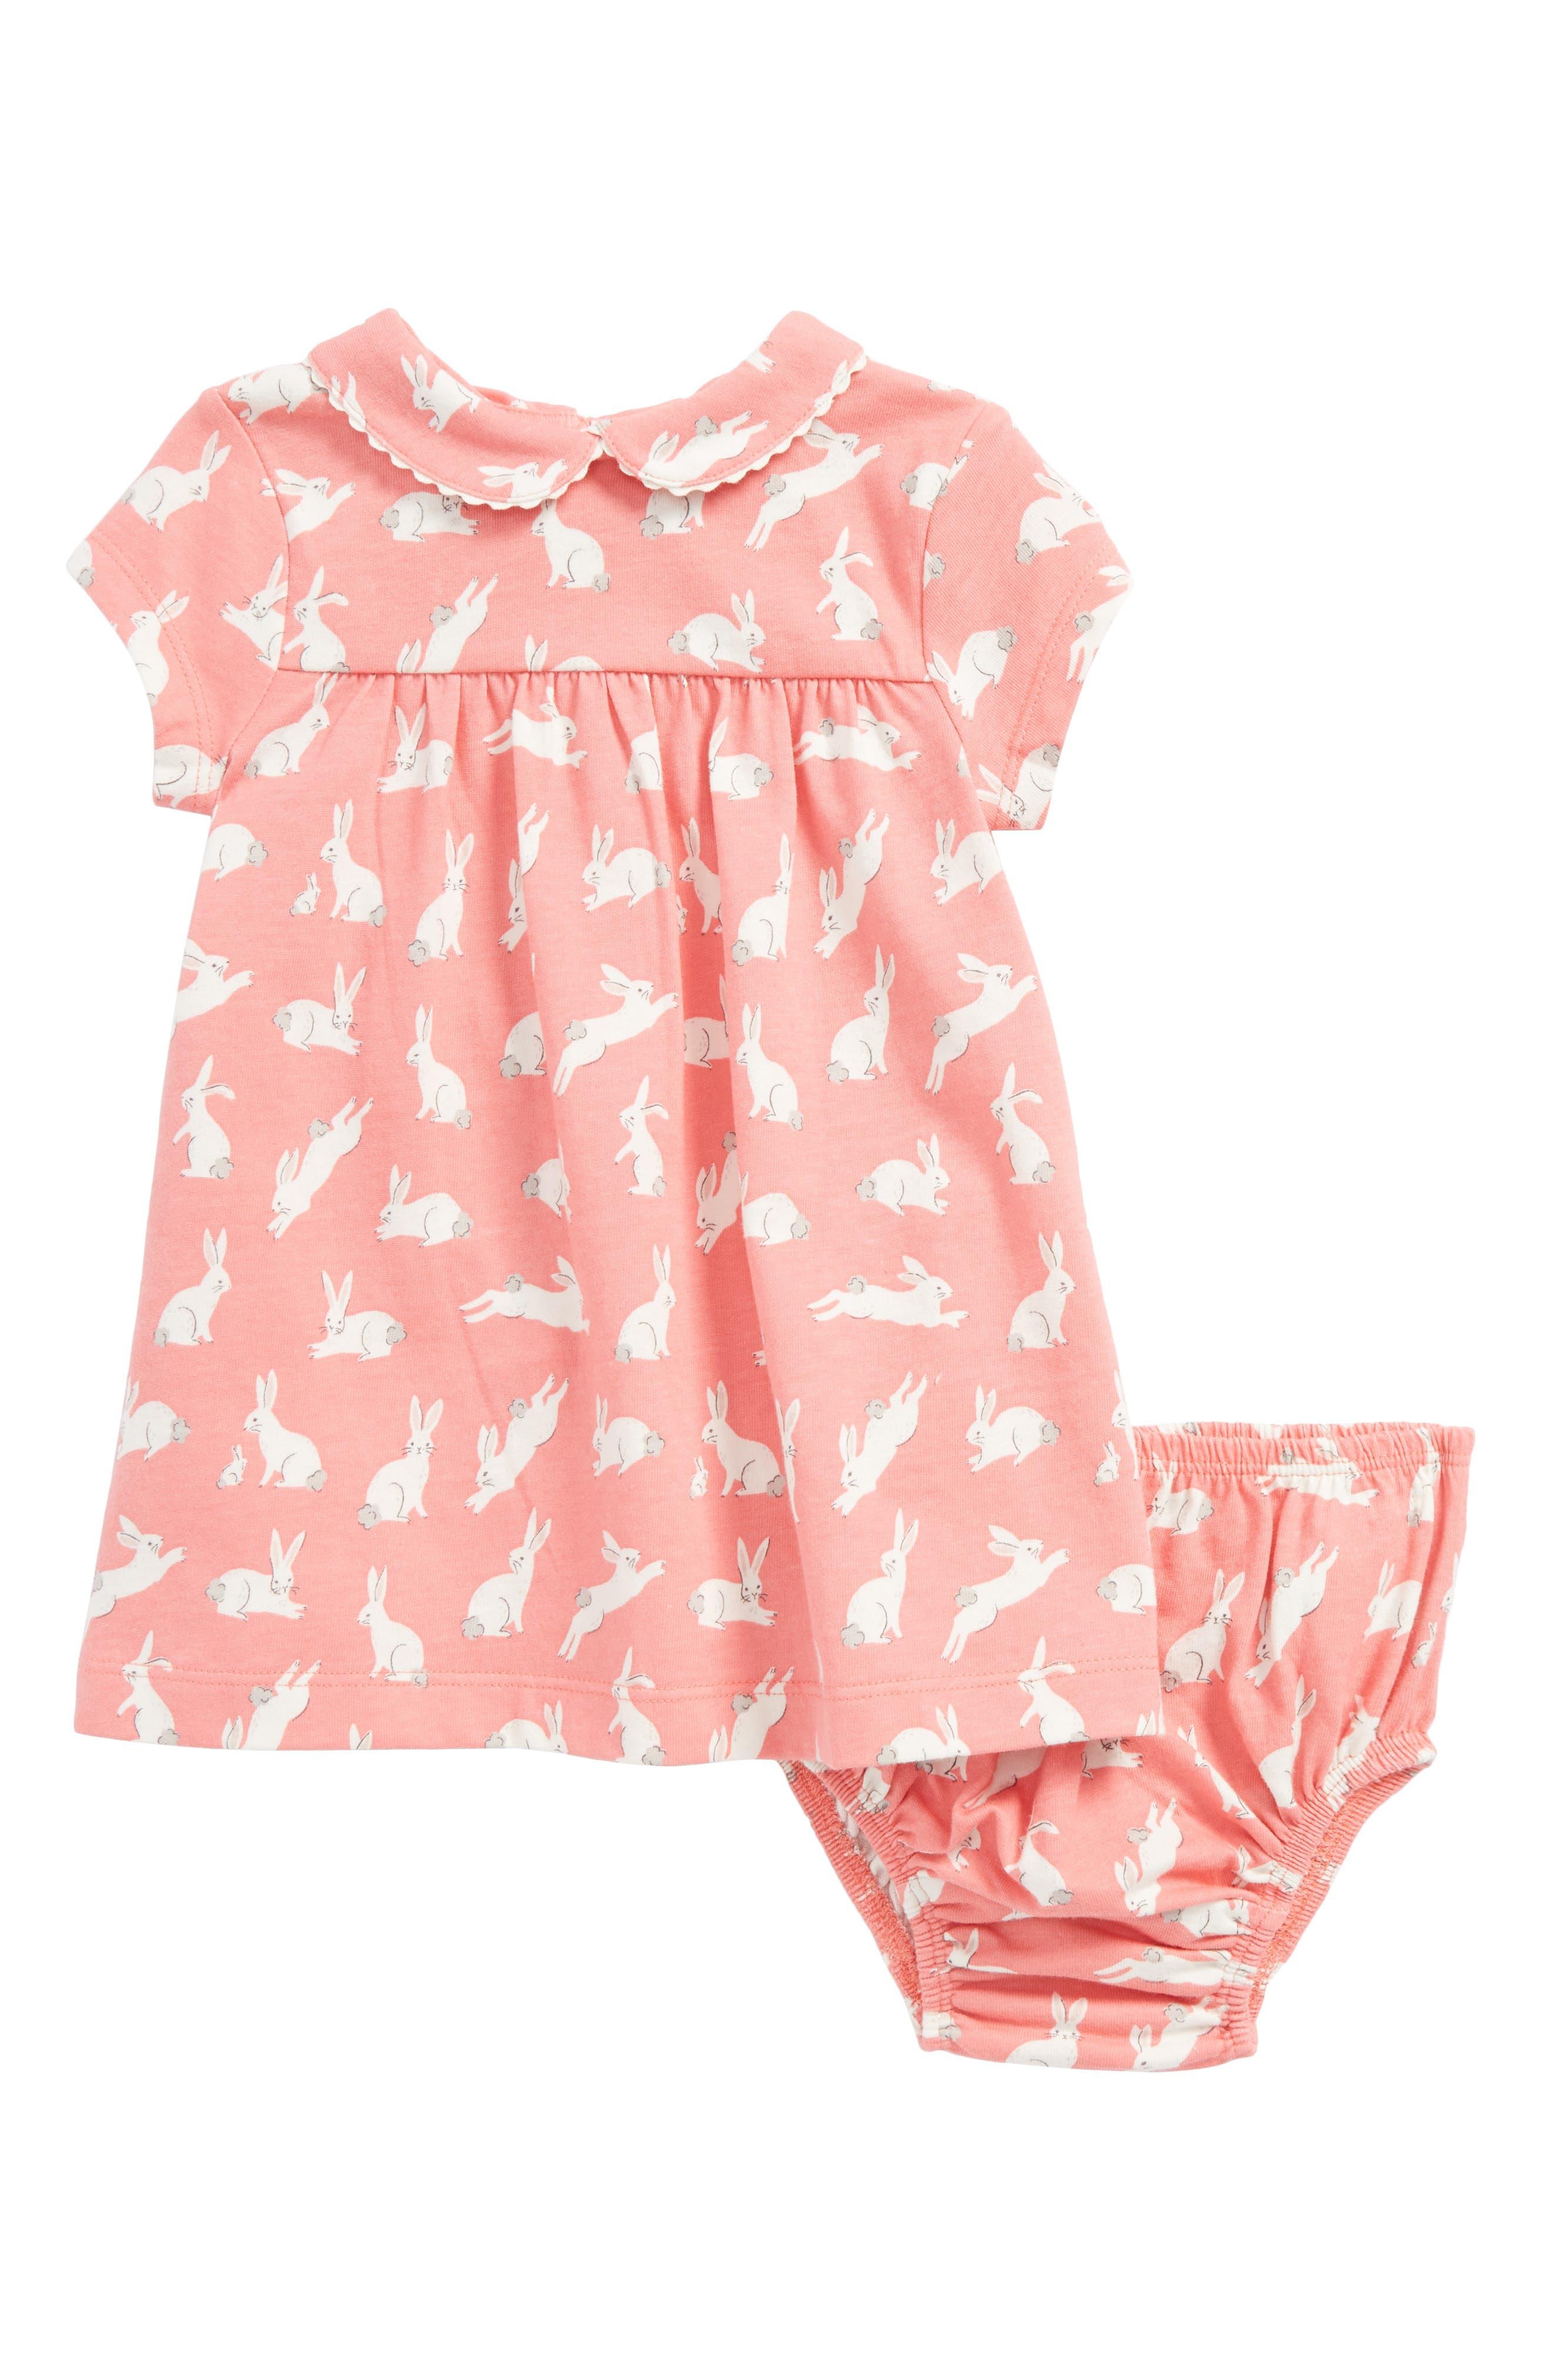 Alternate Image 1 Selected - Mini Boden Bunnies Print Jersey Dress (Baby Girls & Toddler Girls)